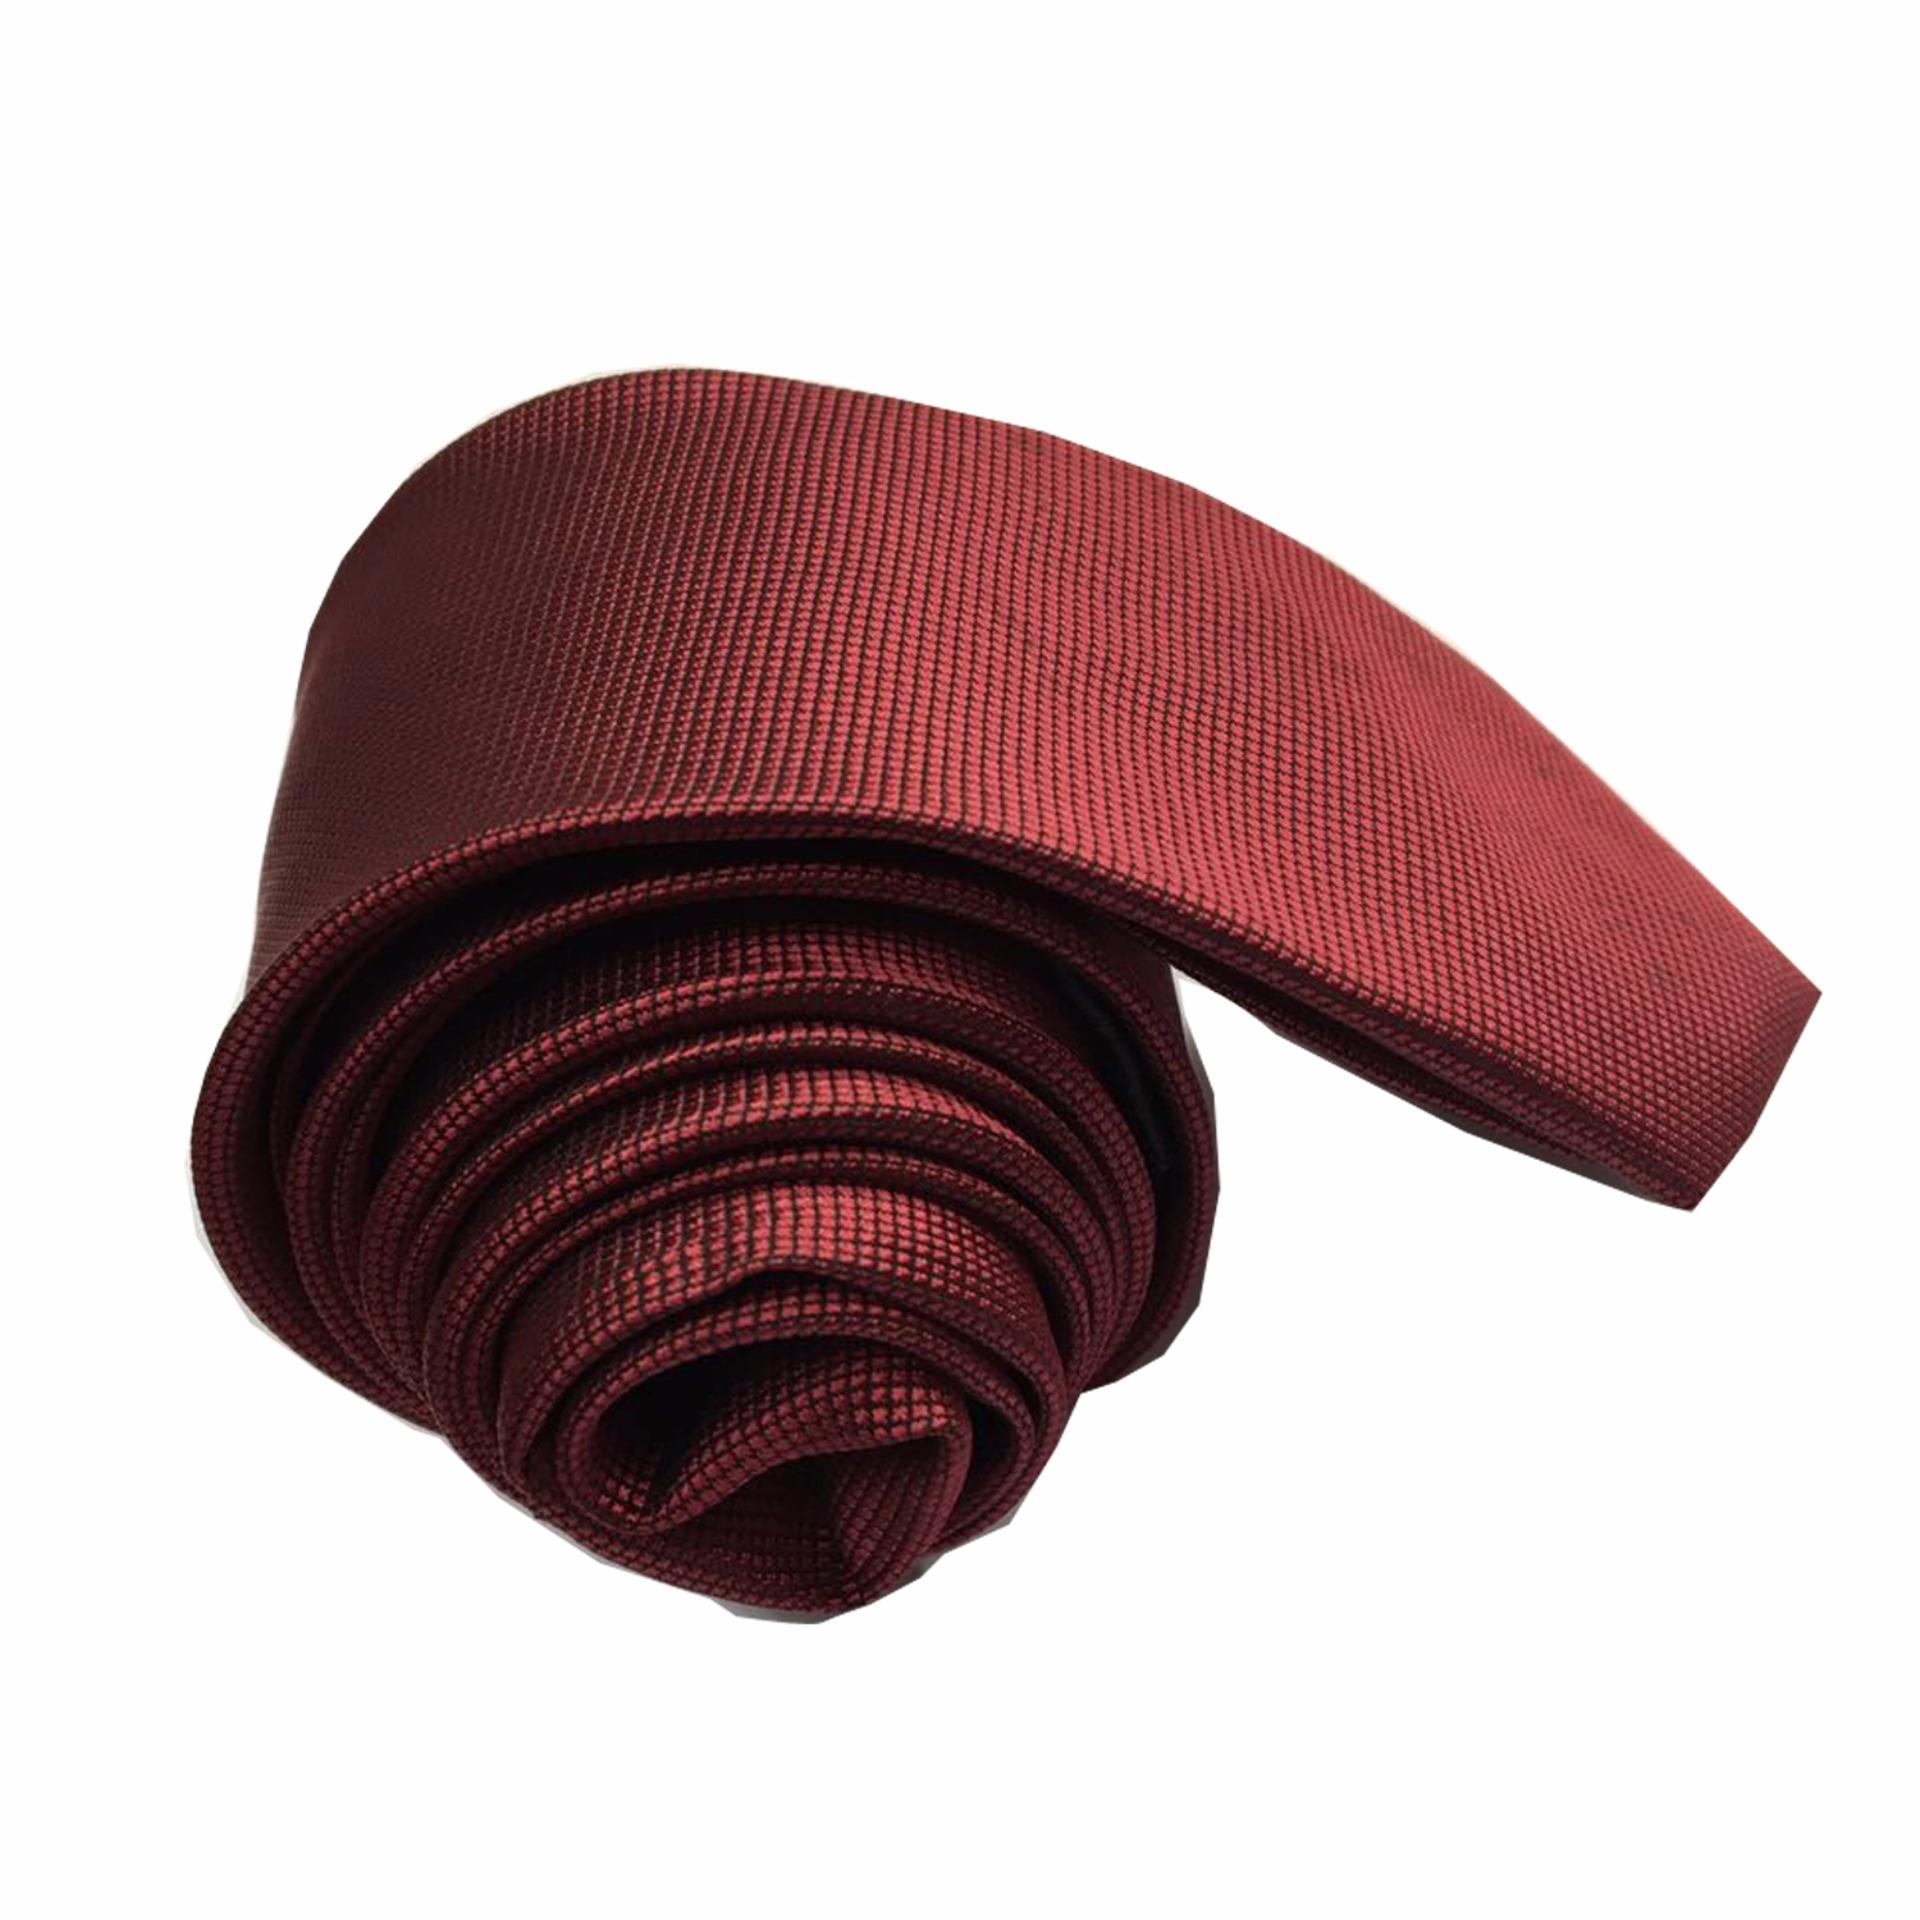 VM Dasi Fashion Slim Merah Maroon - Slim Ties ...